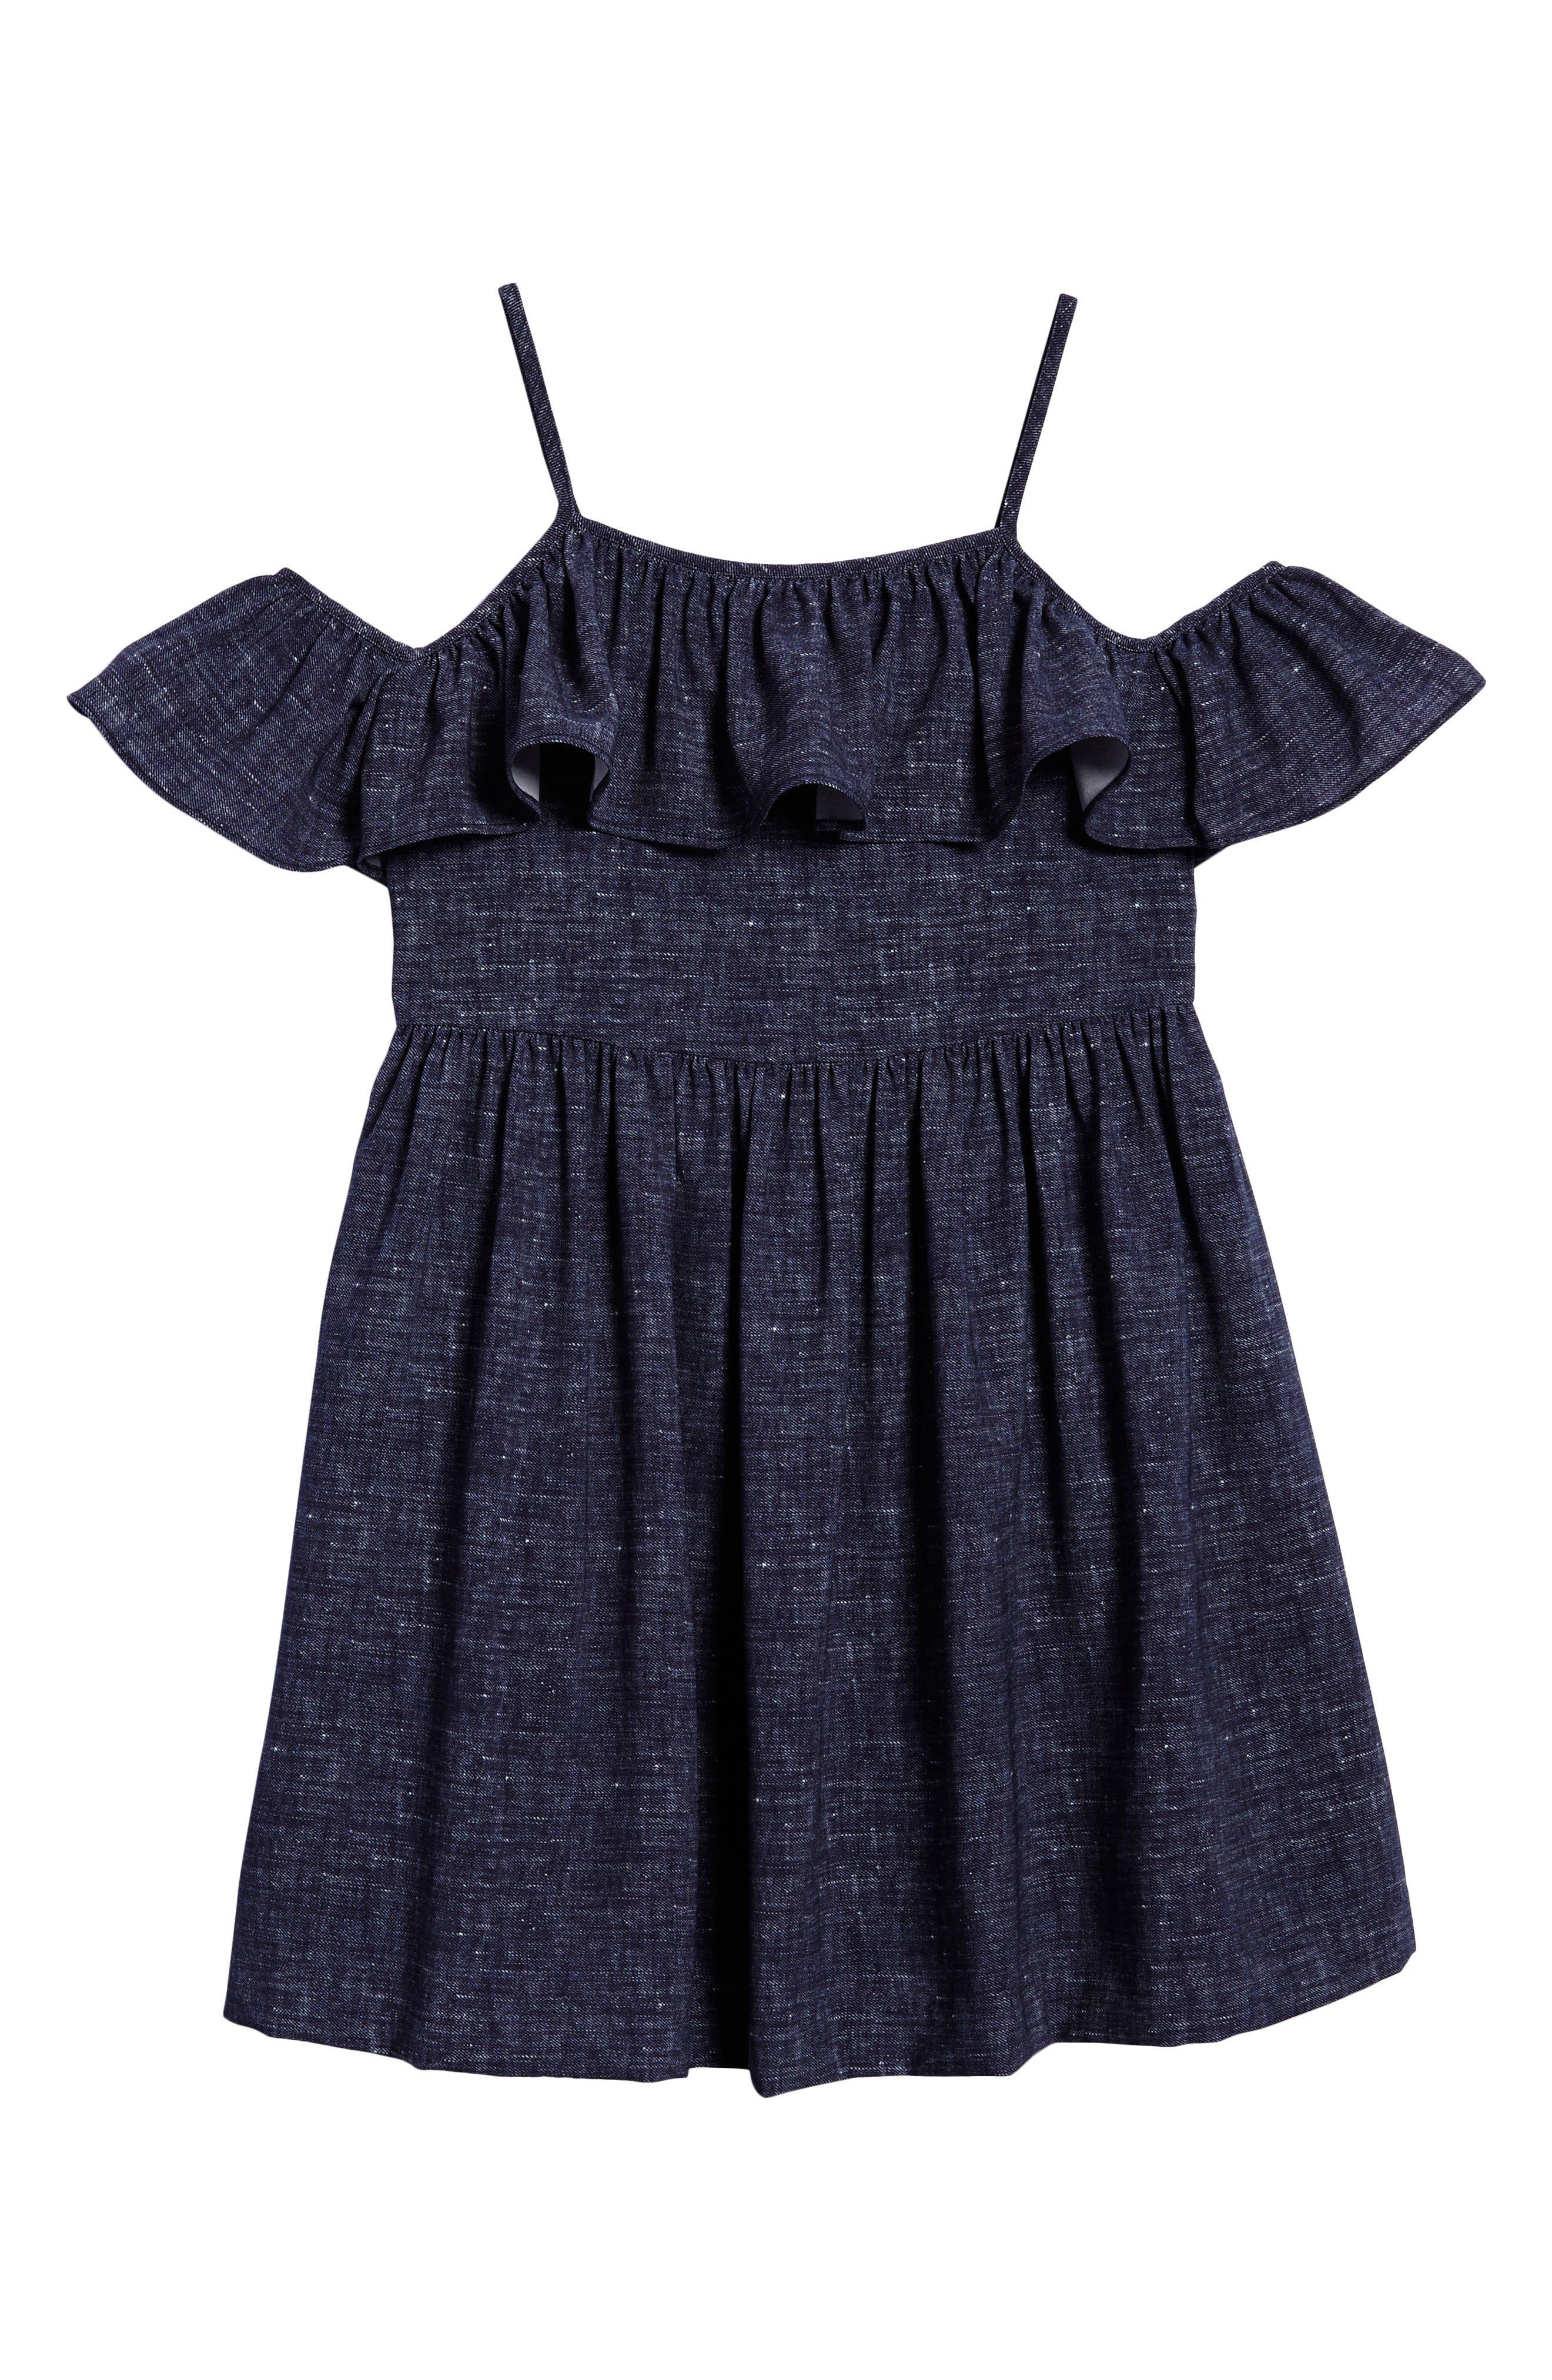 Bella Cold Shoulder Dress,                             Main thumbnail 1, color,                             464